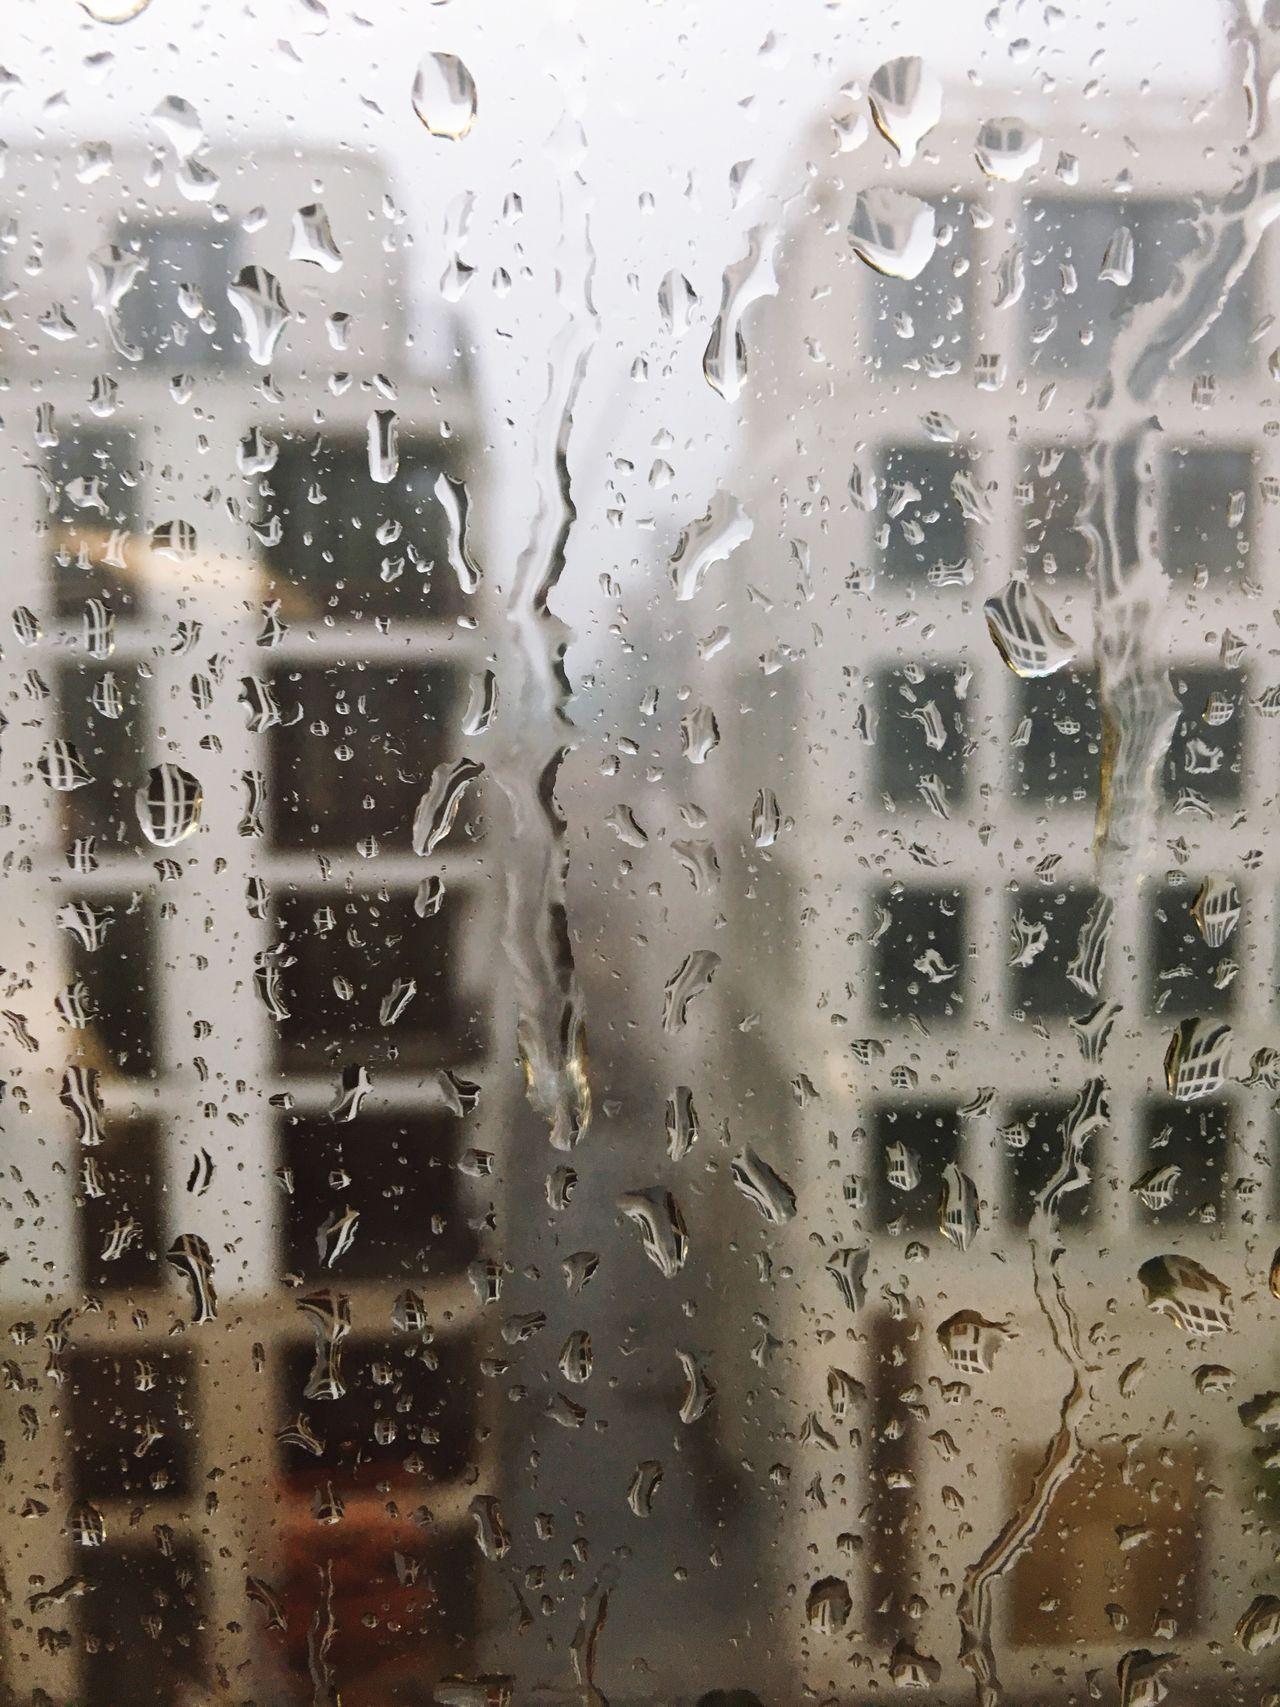 Es regnet, es regnet. Die Erde wird naß … Rain Thunderstorm Berlin Berlin Mitte No People Regen Starkregen Wetter Sommer Abkühlung